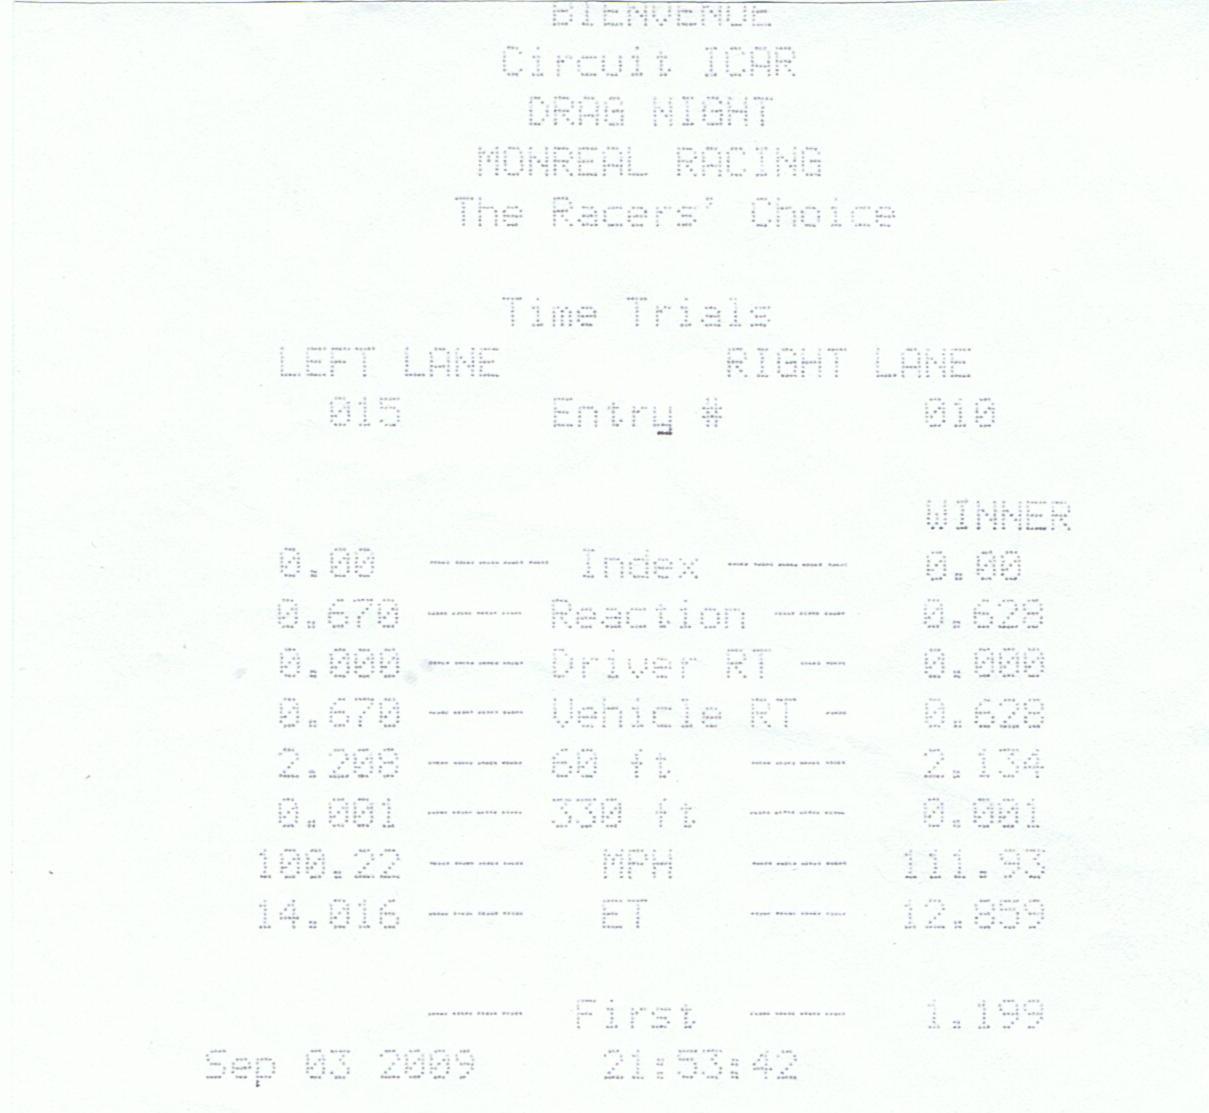 Nissan Altima Timeslip Scan